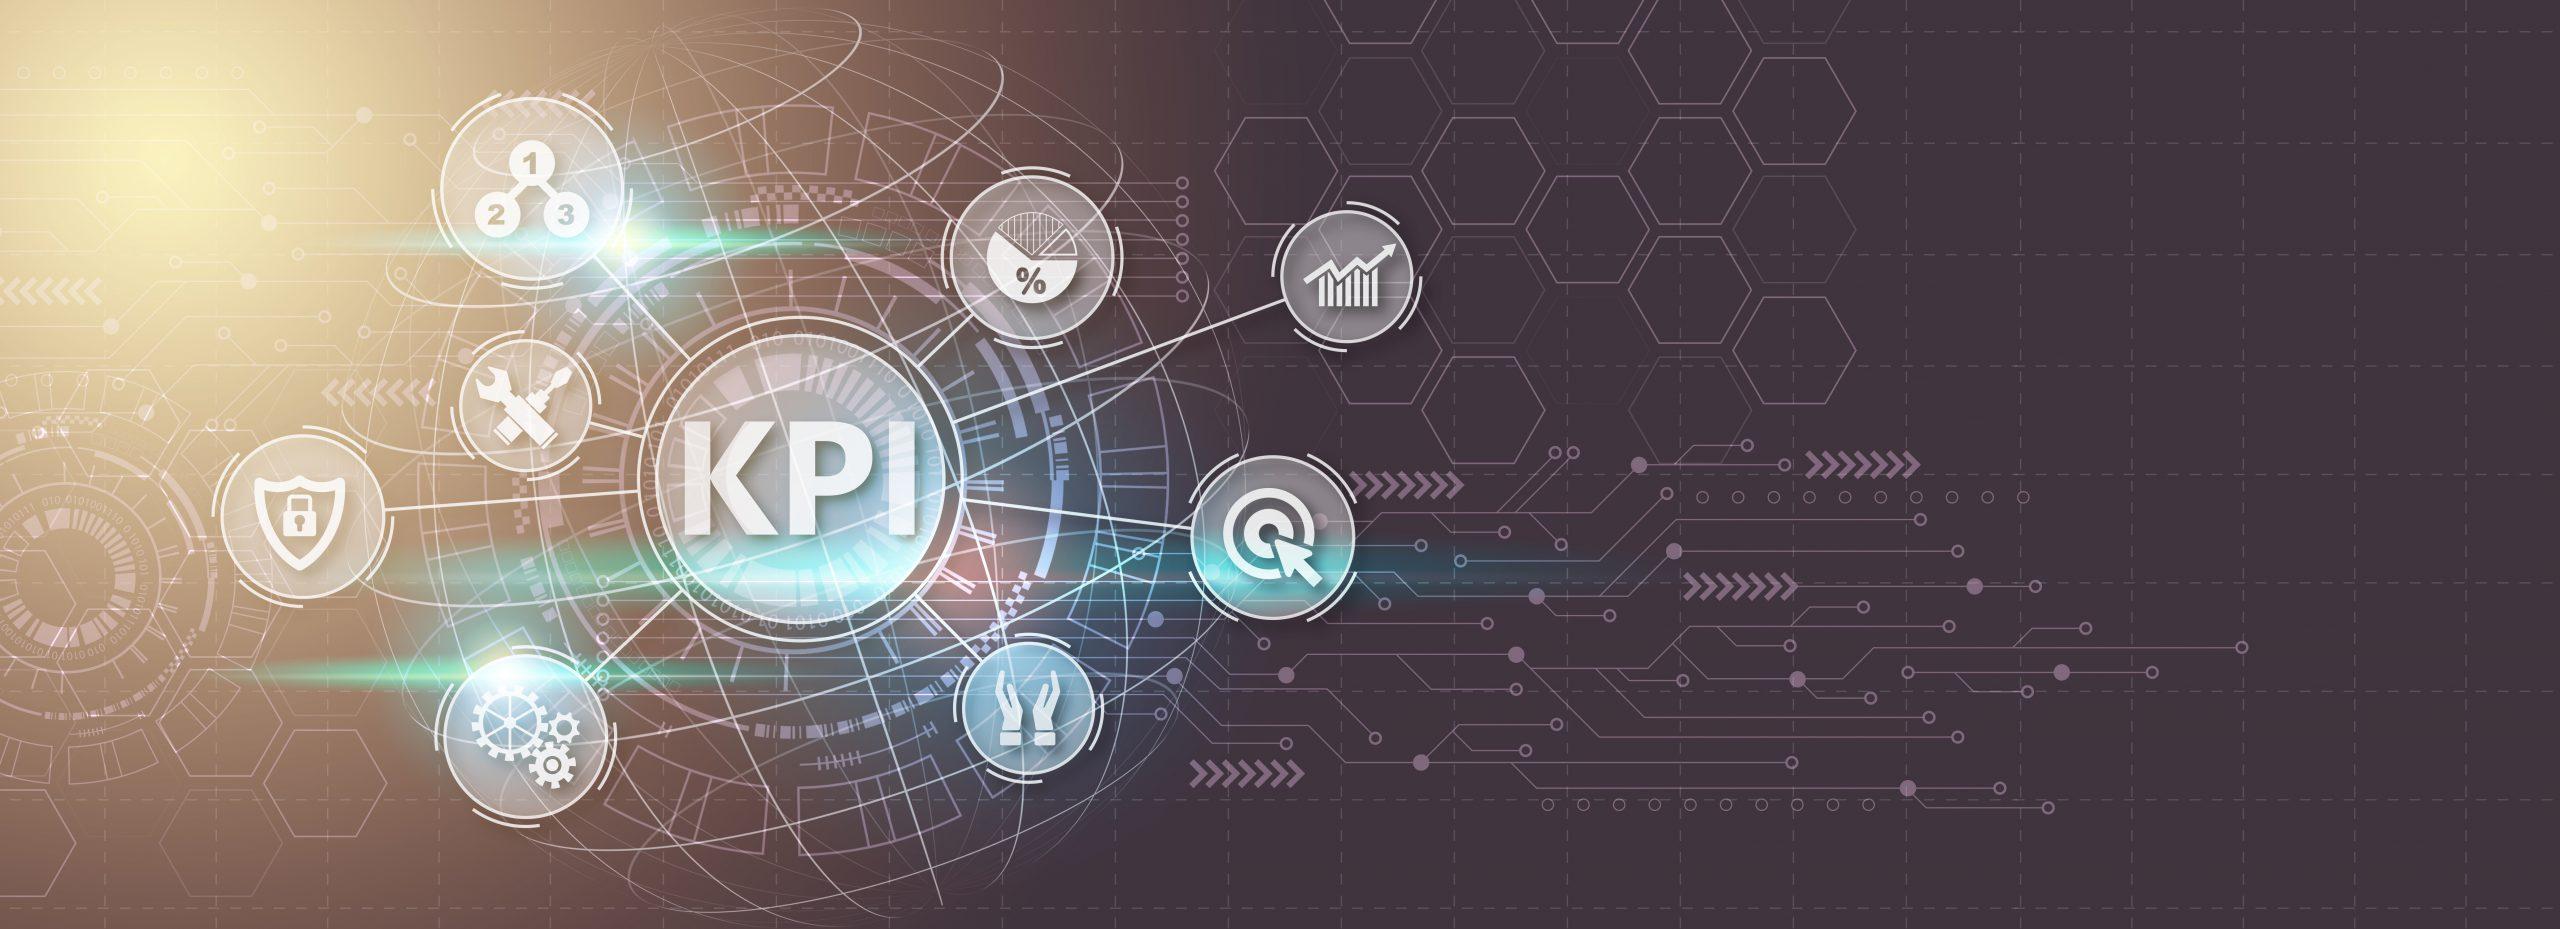 KPI Banner Image